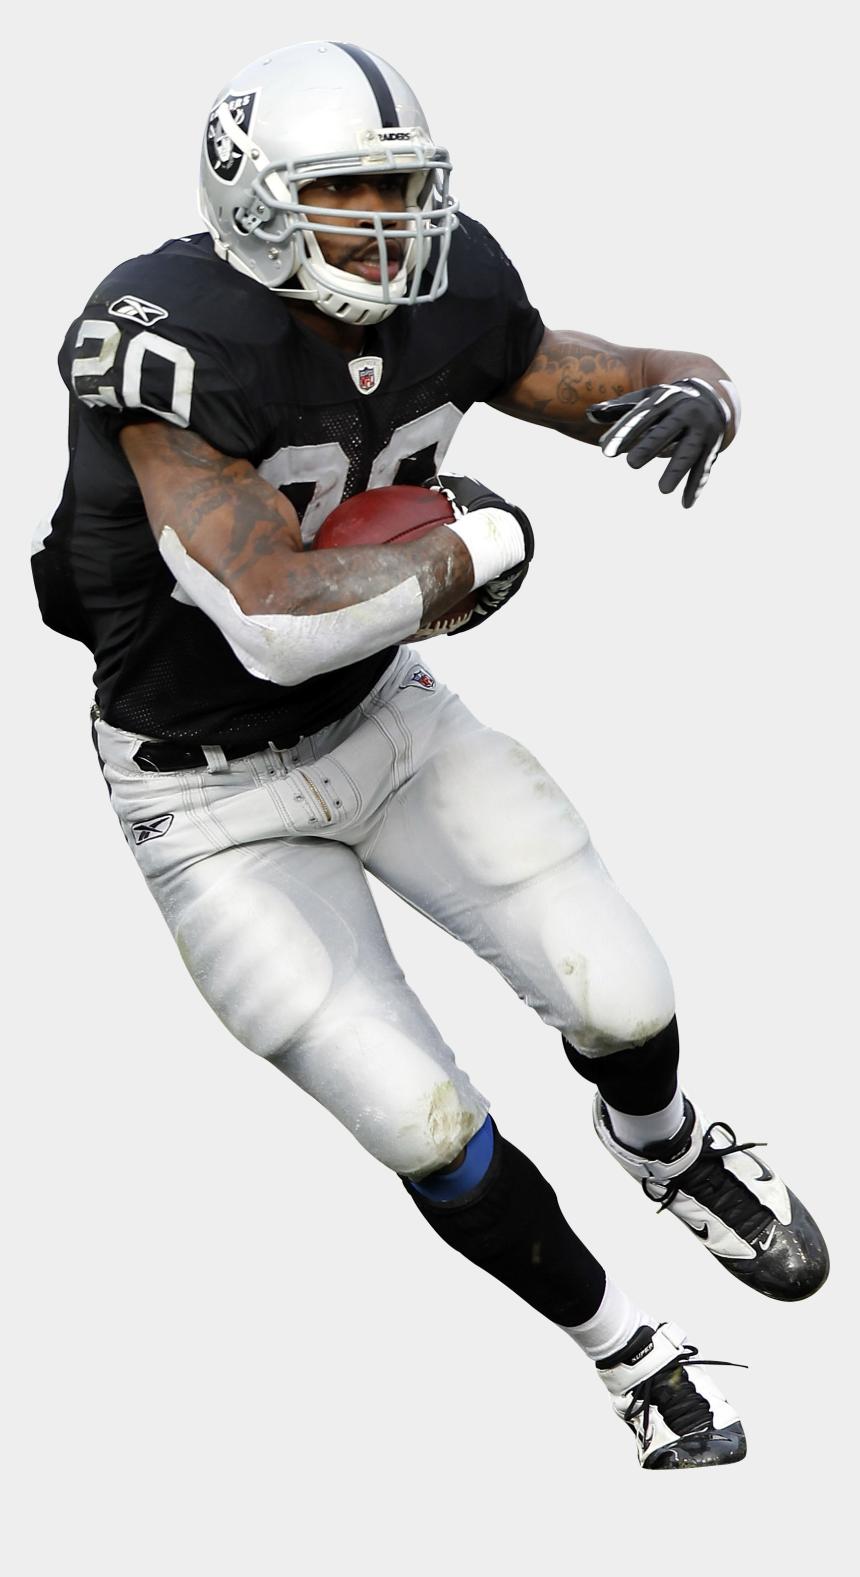 raiders clipart, Cartoons - Alumni - Oakland Raiders - - Oakland Raiders Player Png